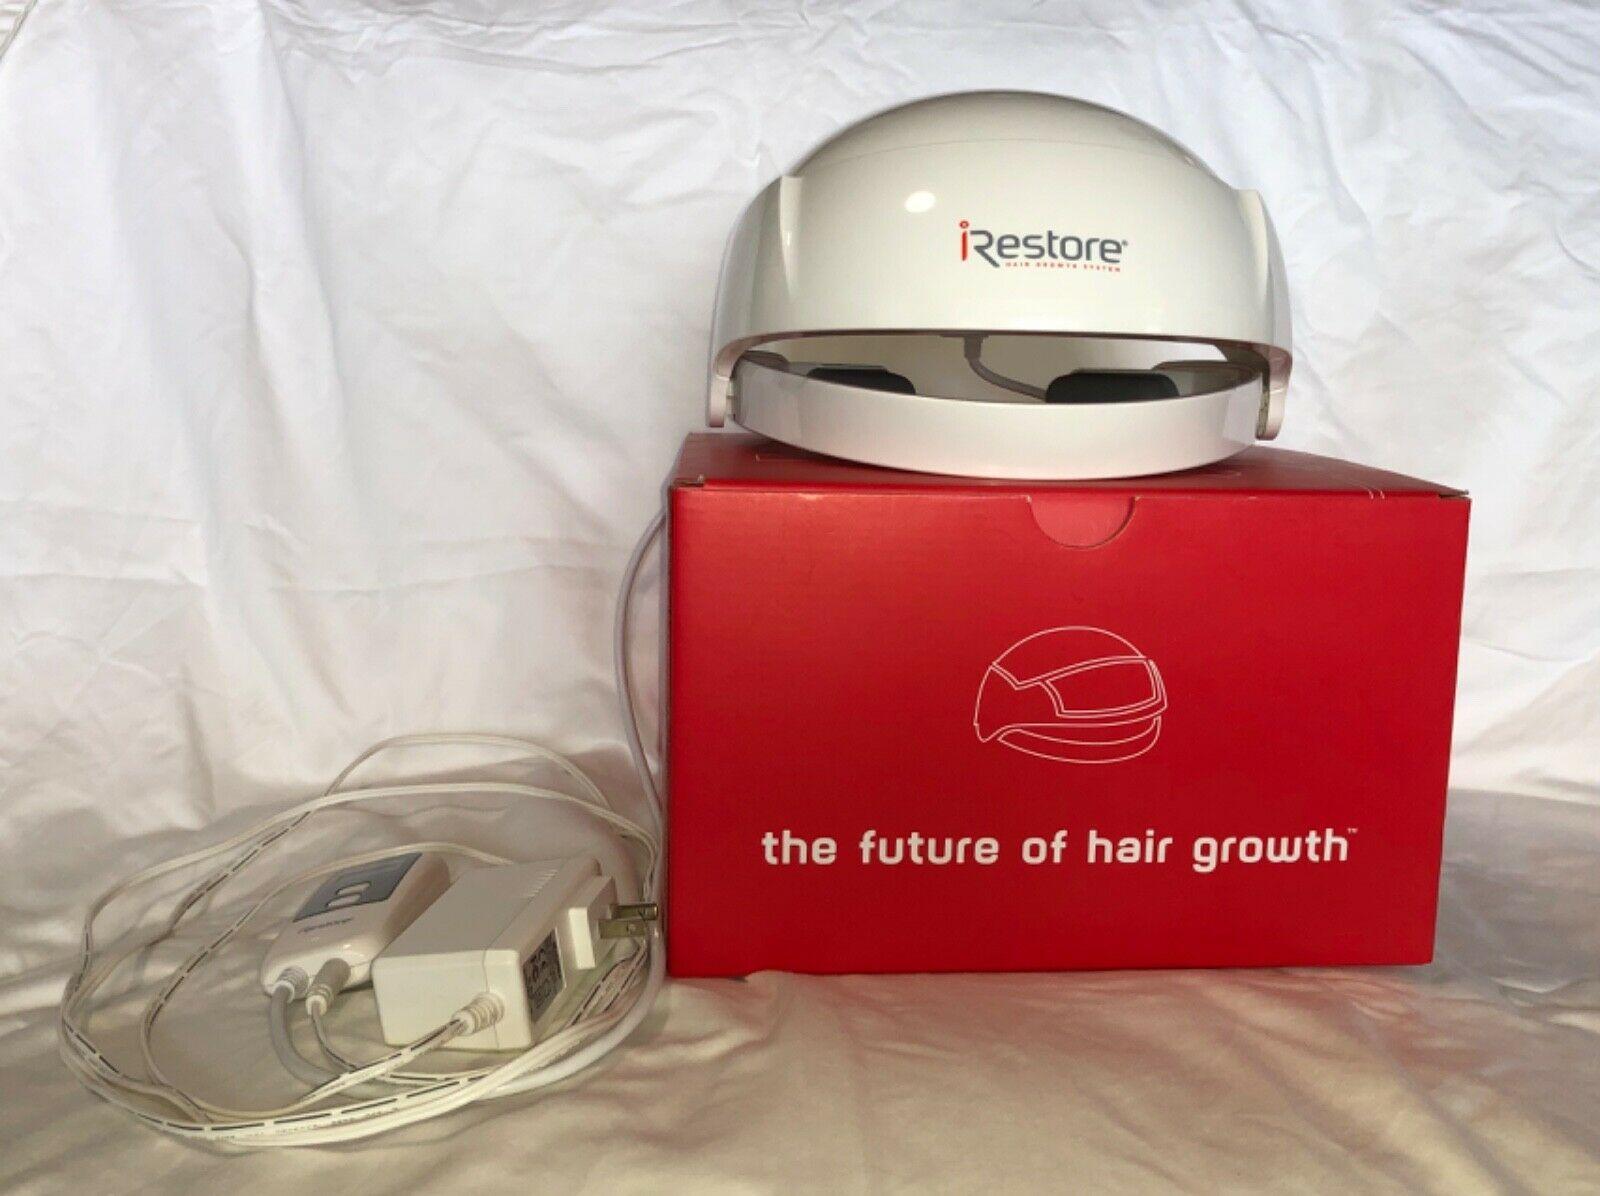 iRestore Essential Laser Hair Growth System hairgrowth in